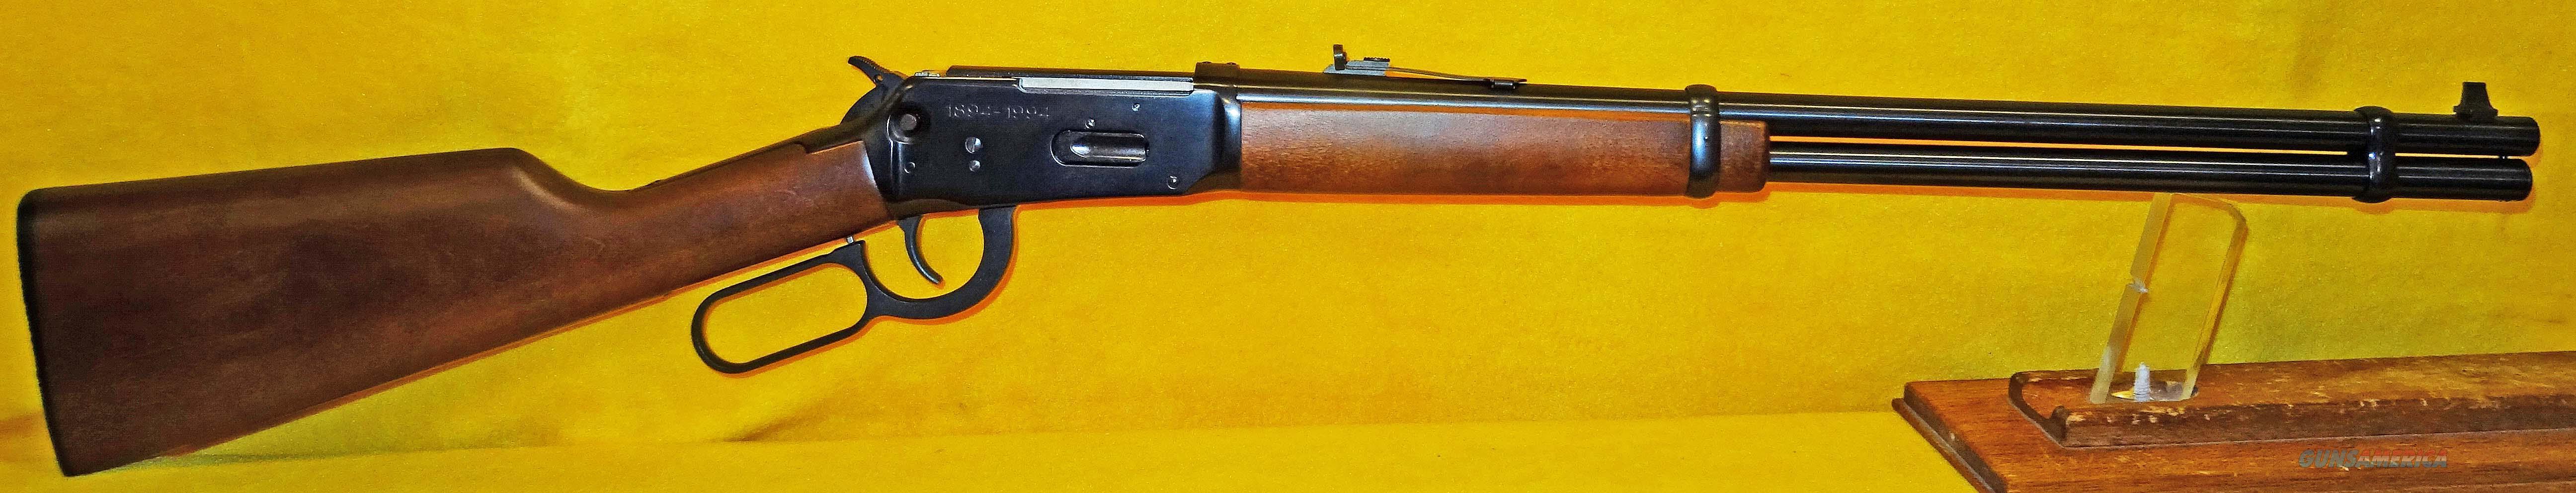 WINCHESTER (100TH YEAR) 94 (RANGER)  Guns > Rifles > Winchester Rifles - Modern Lever > Model 94 > Post-64